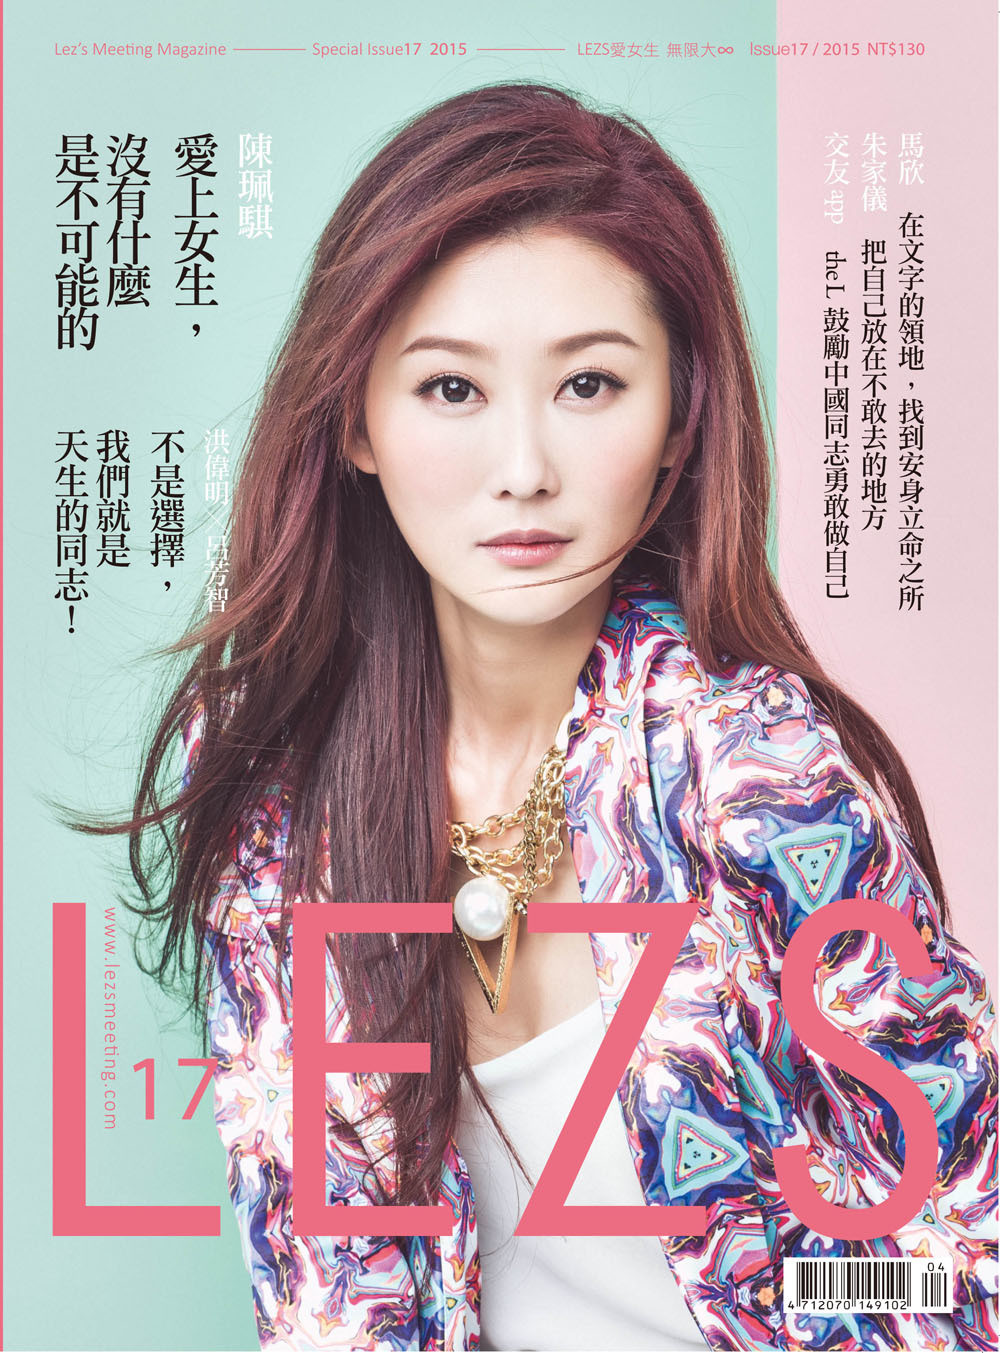 LEZS 女女雜誌 第十七刊 Lesbian Culture Magazine